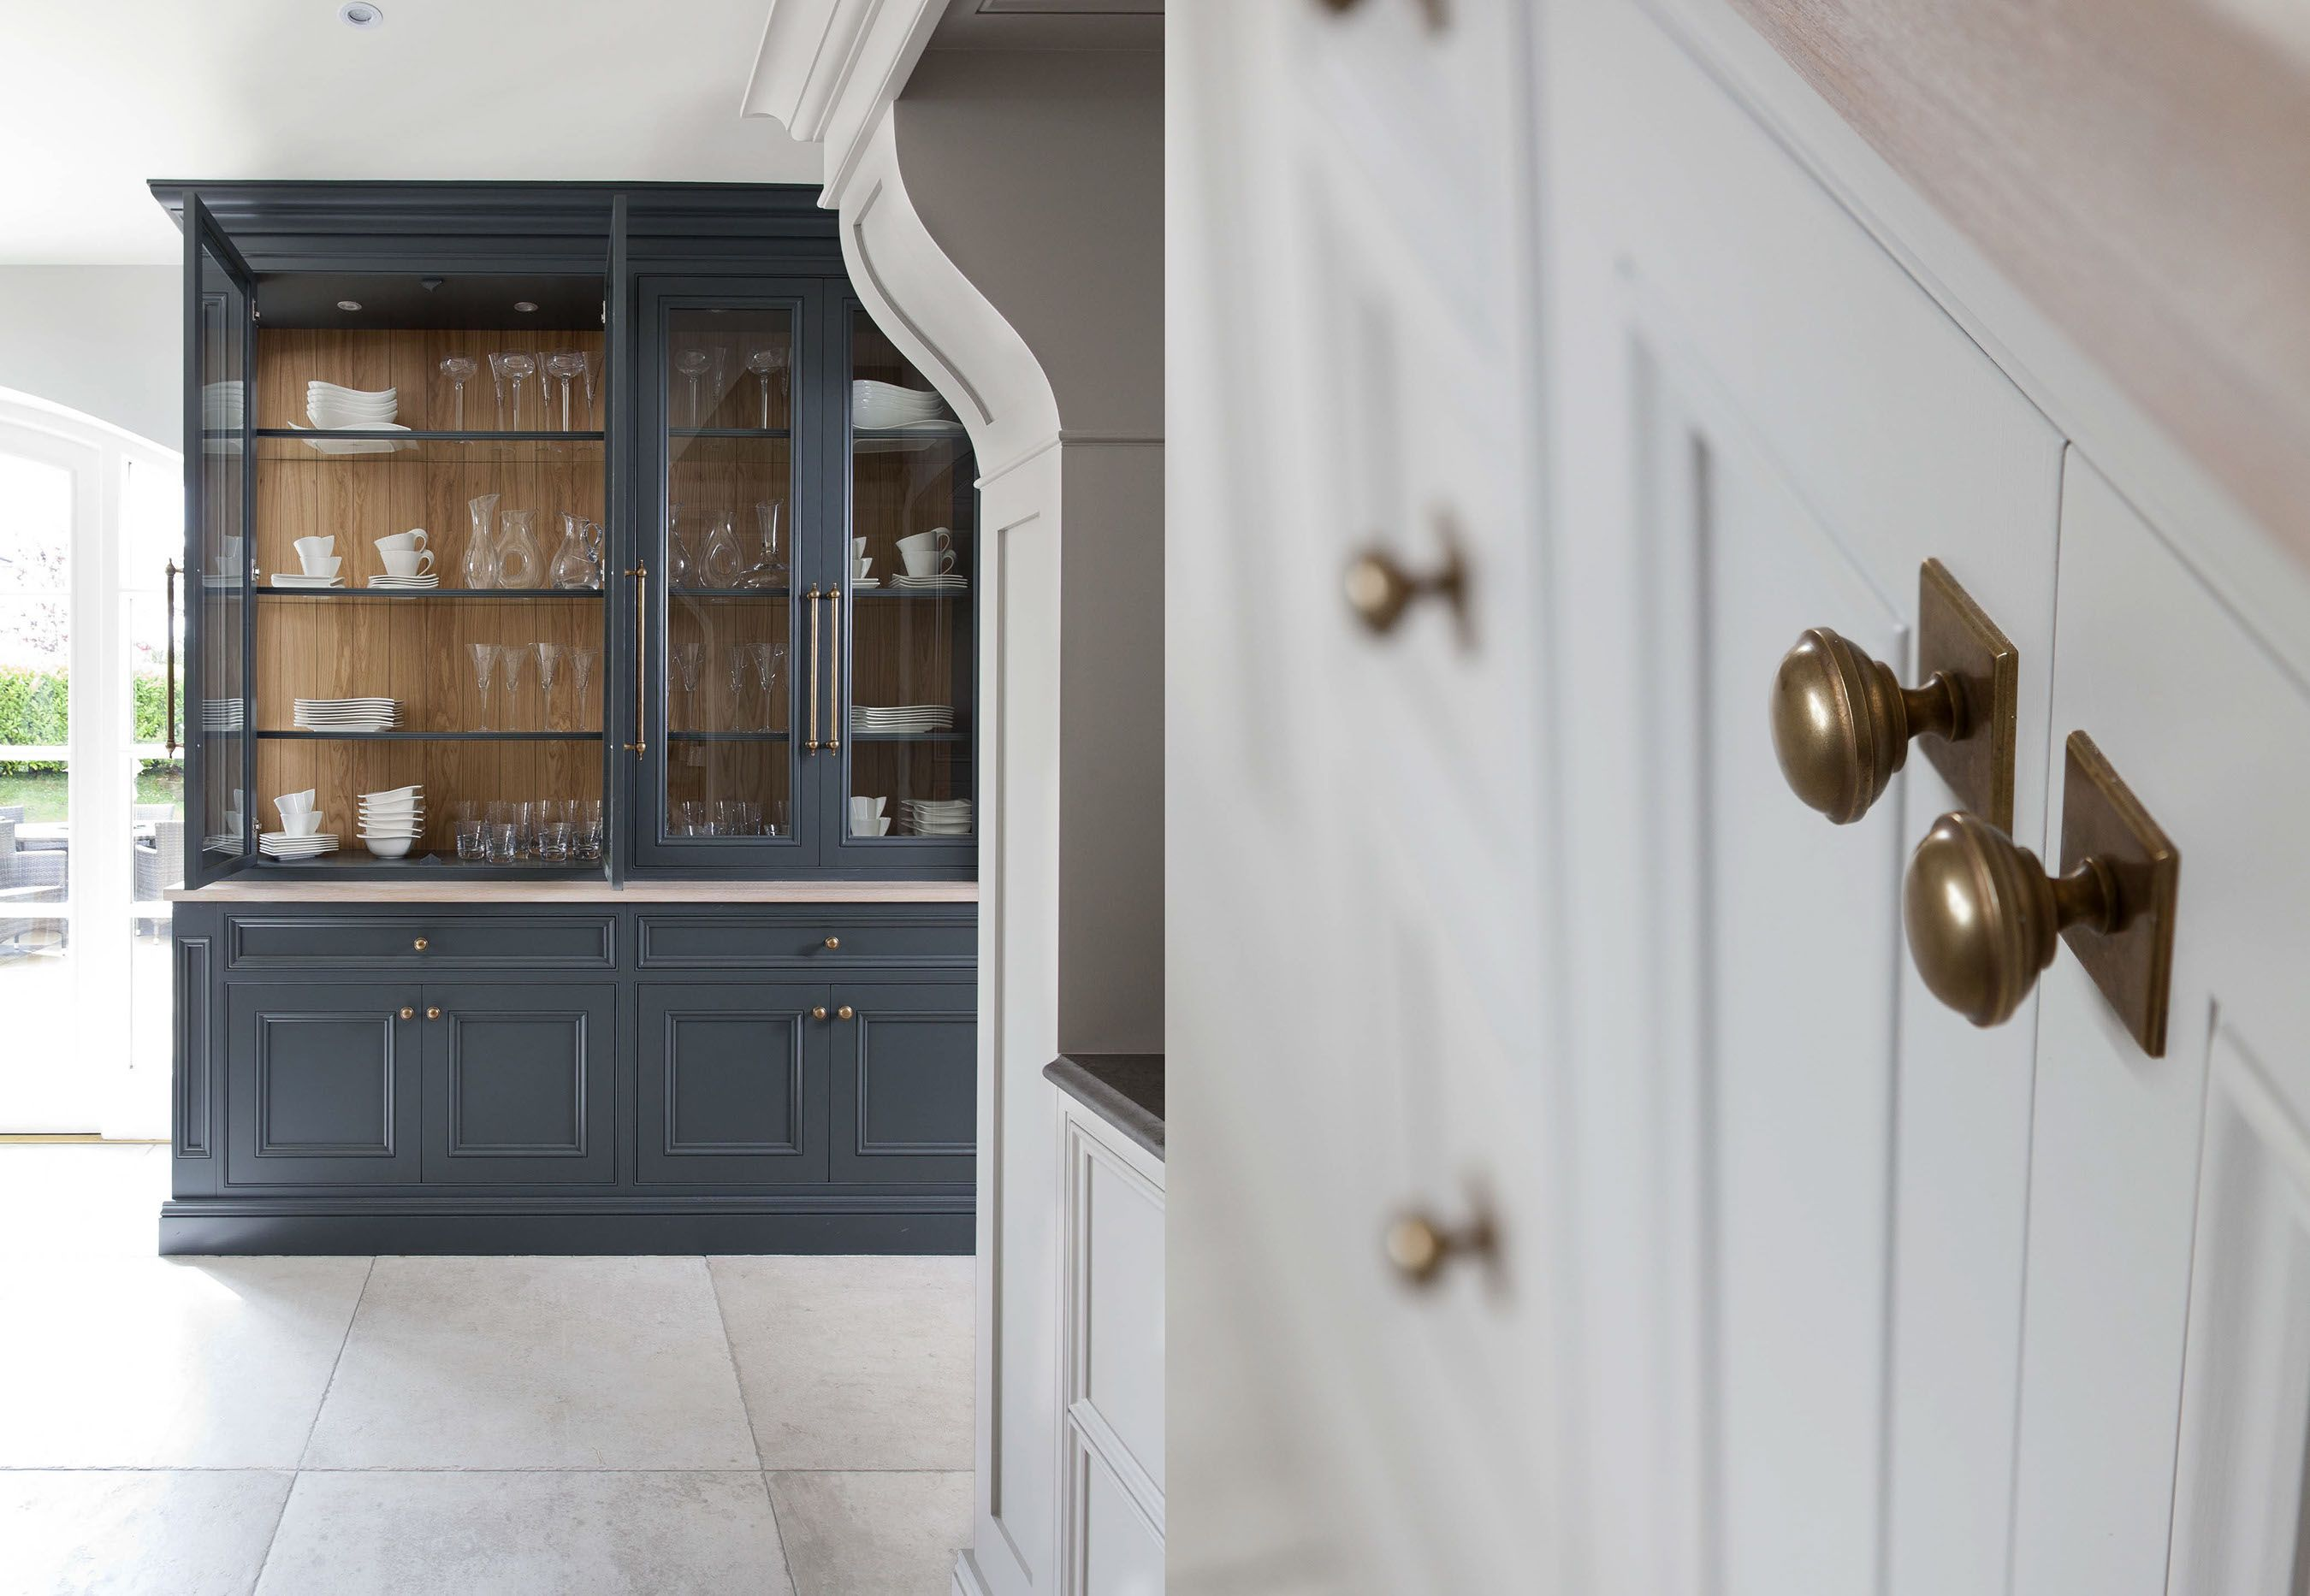 Inframe painted kitchen luxury kitchens beautiful